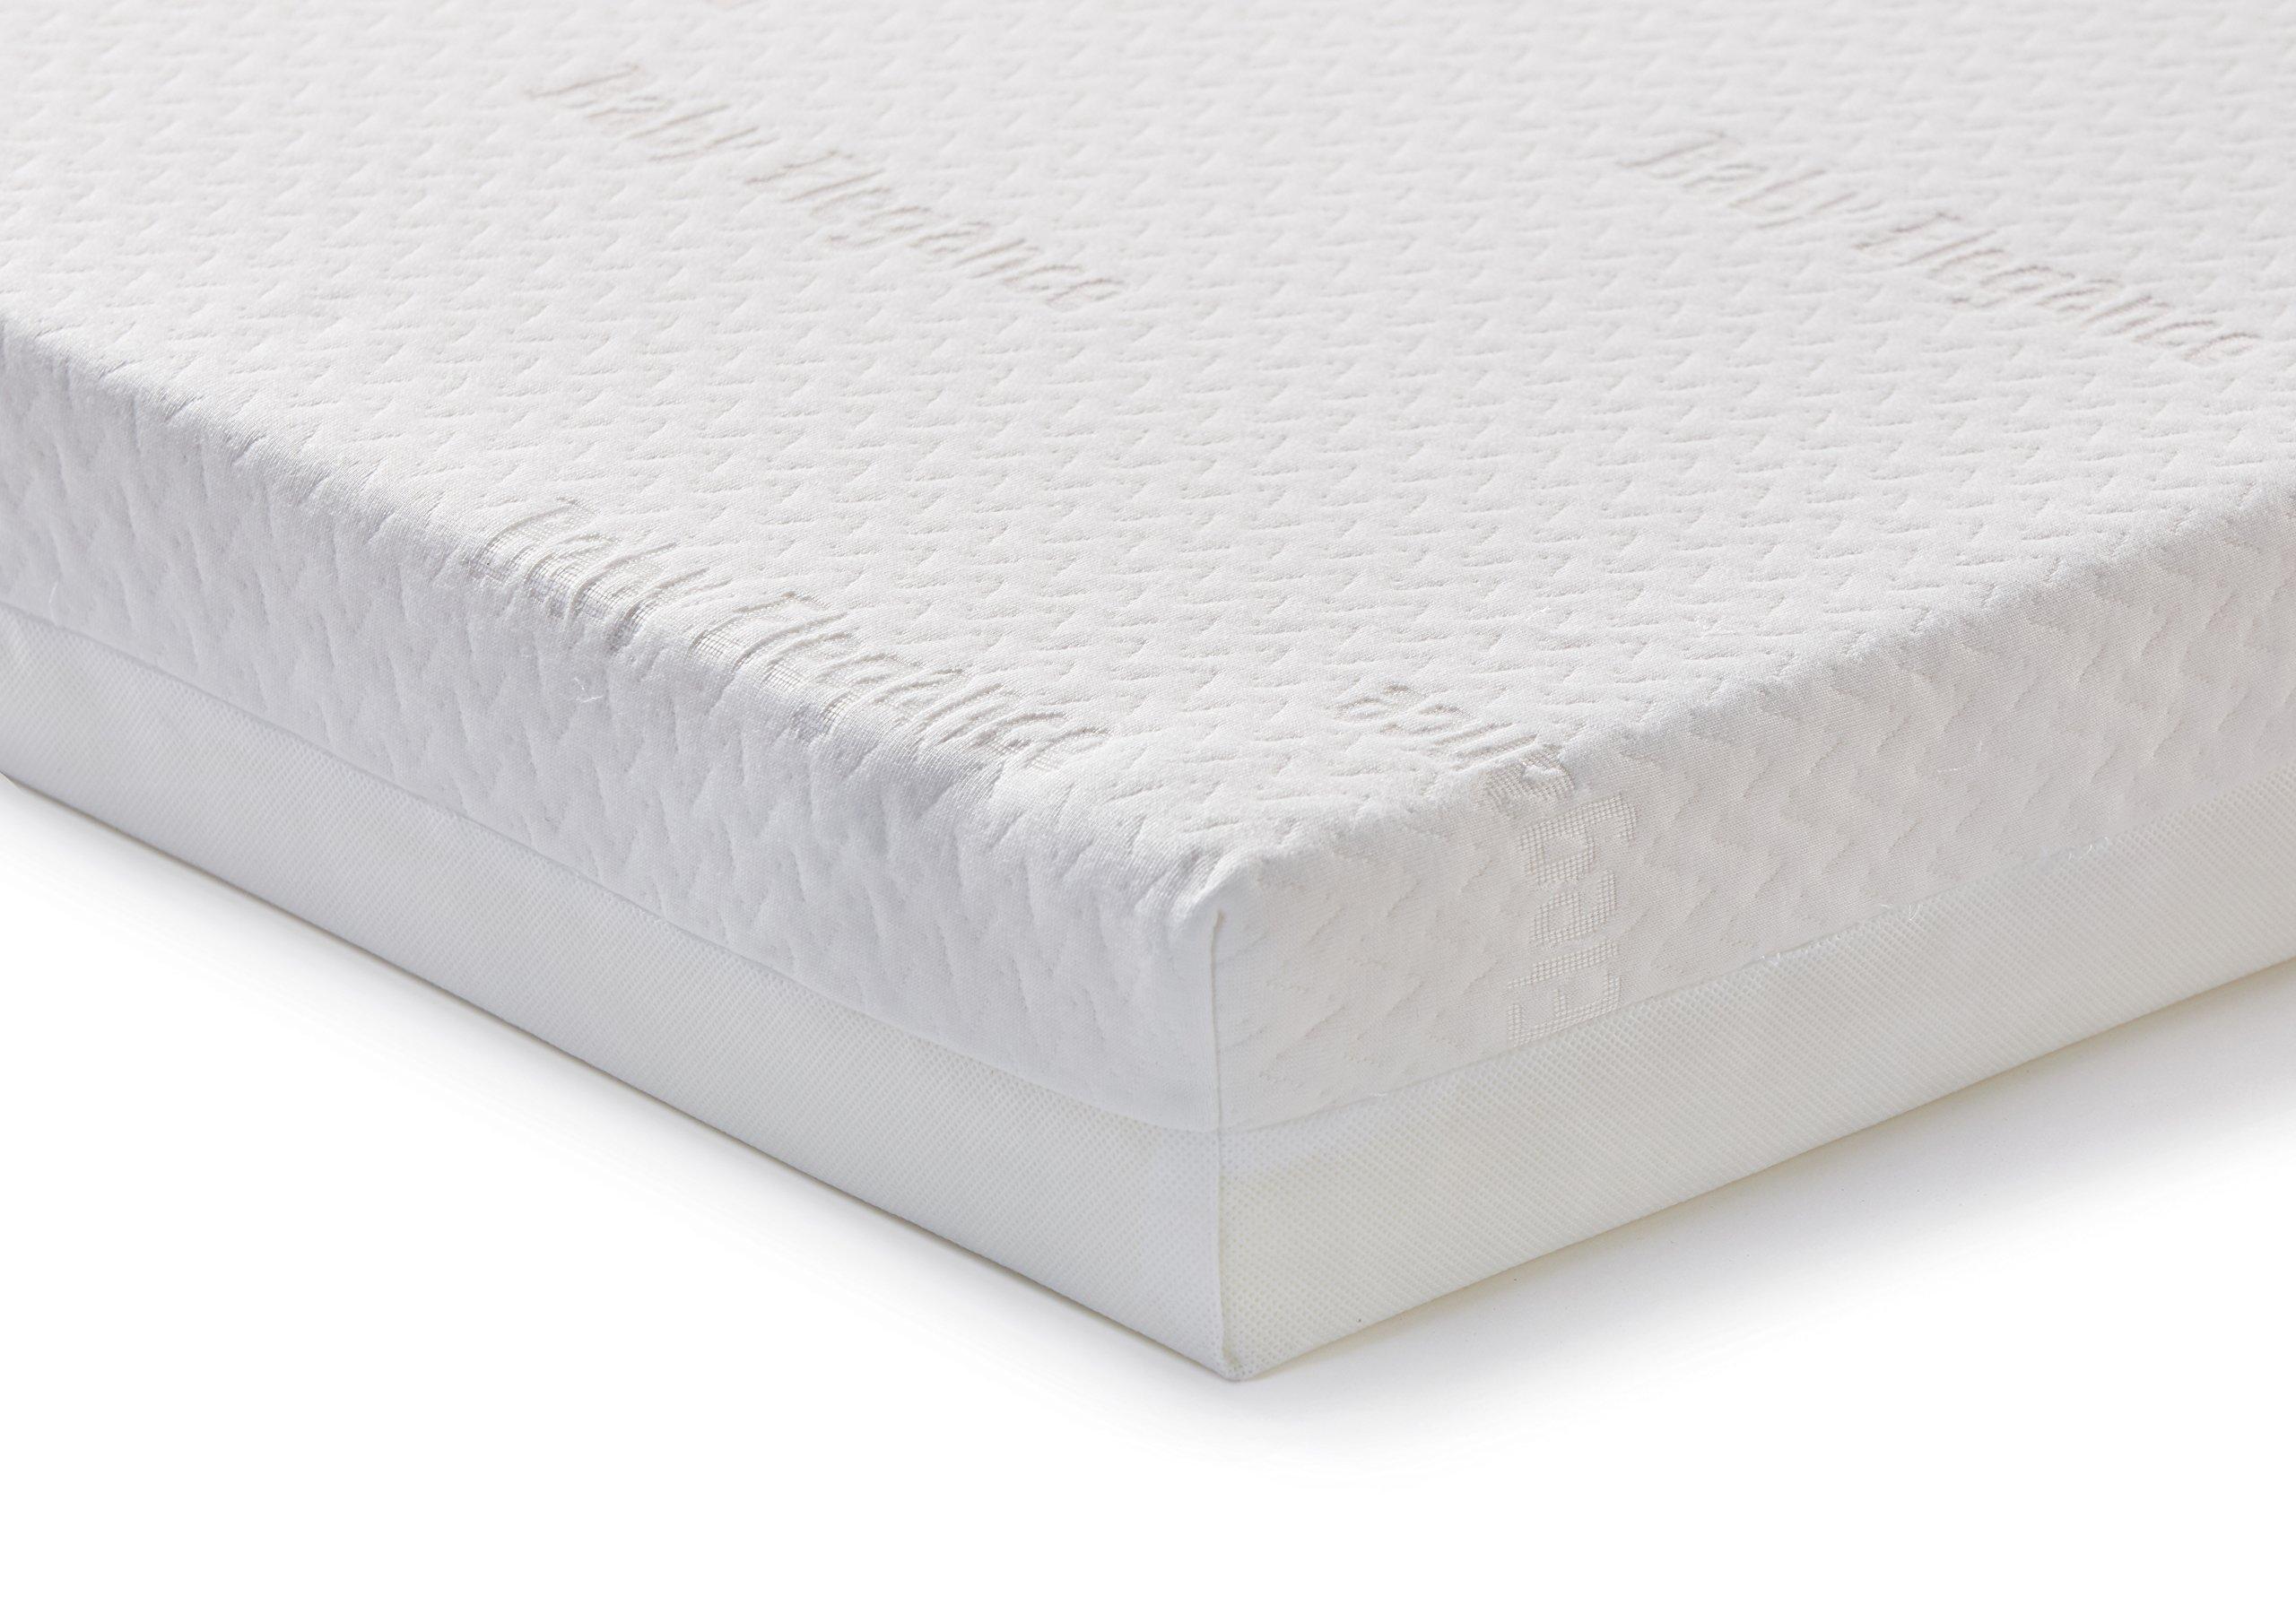 120 x 60 x 10 cm Baby Cot Mattress for Cot Bed//Cribs All Sizes Ultra Fibre Eco-Friendly Mattress